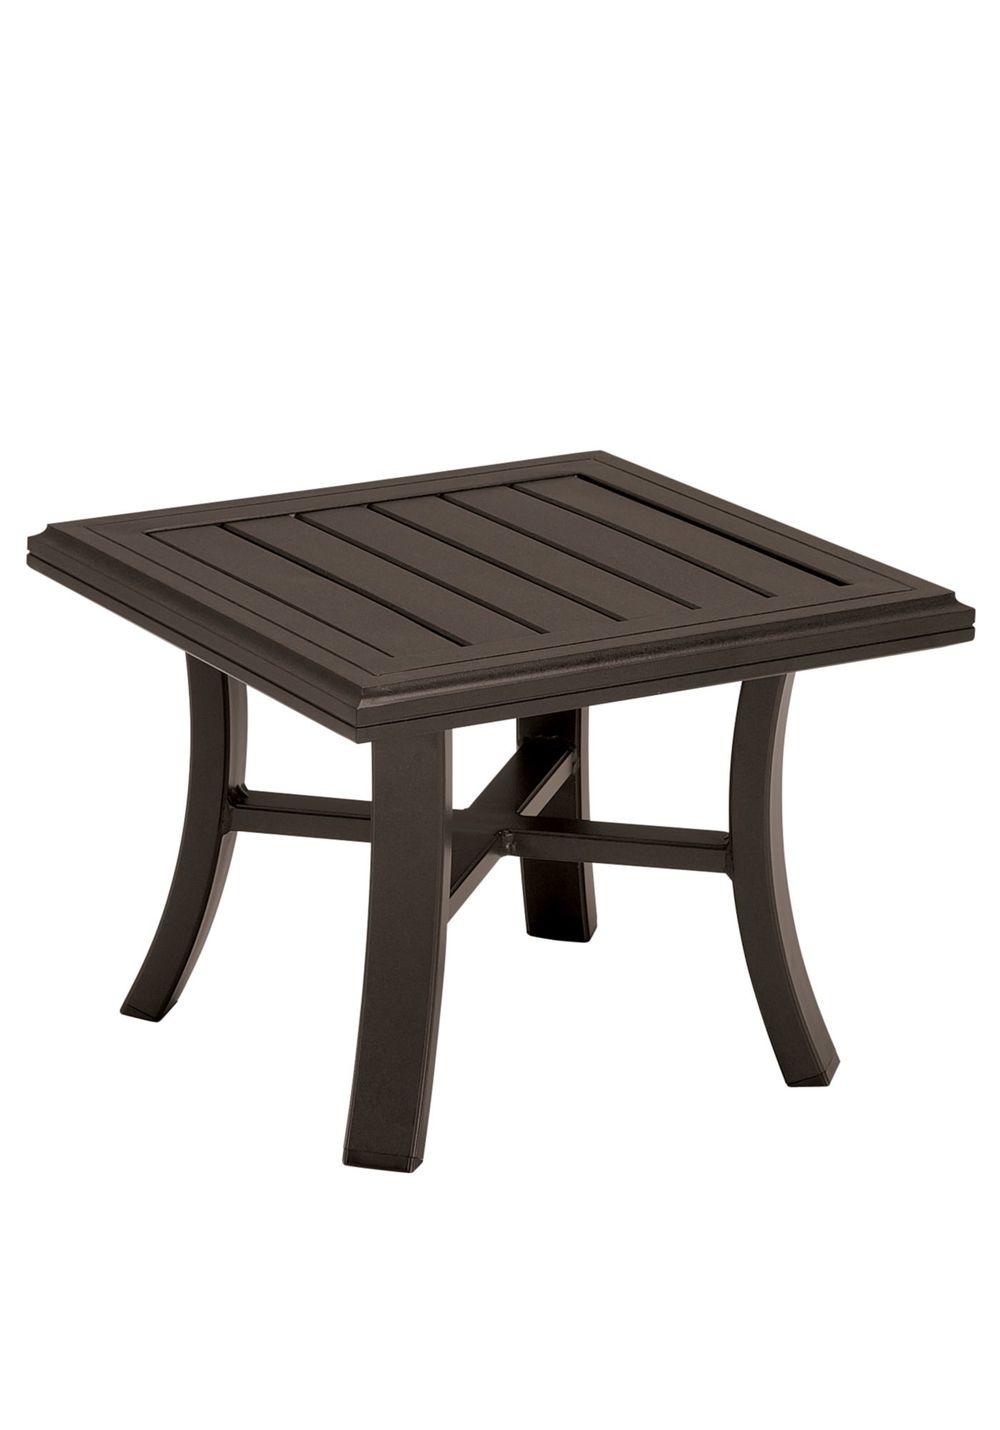 Tropitone Furniture - Square Tea Table